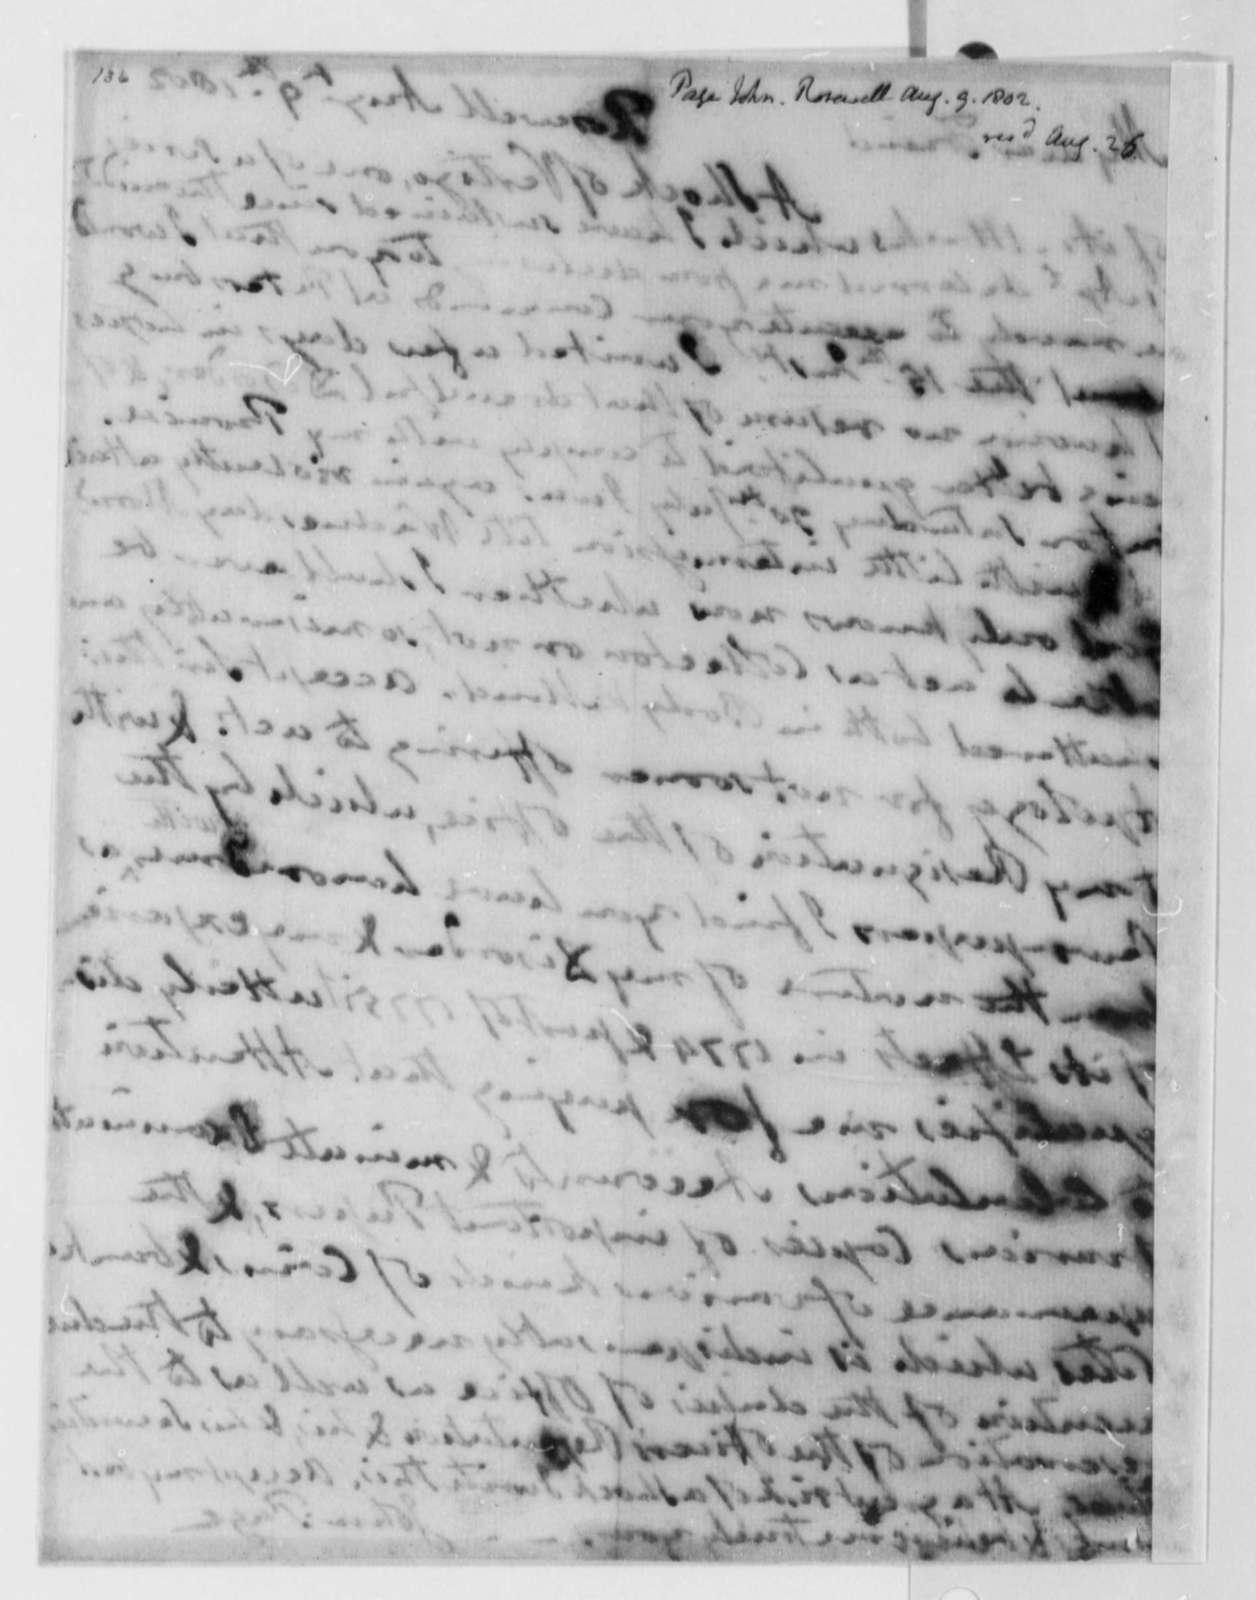 John Page to Thomas Jefferson, August 9, 1802